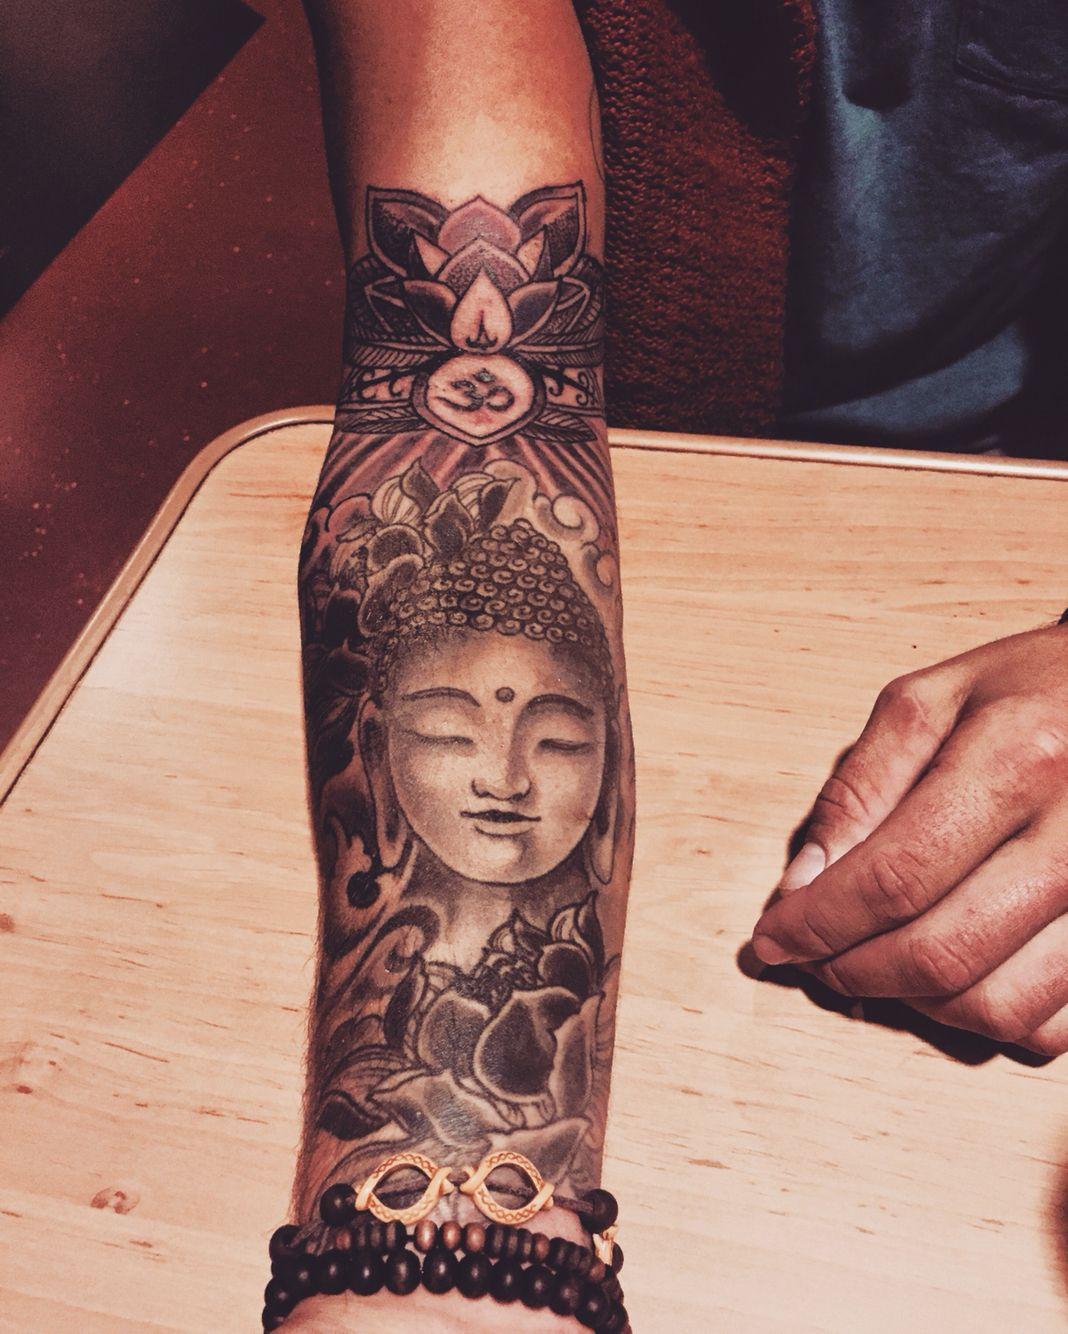 Budha tattoo with lotus lotus tattoo budha cool awesome budha tattoo with lotus lotus tattoo budha cool tinta tatoo izmirmasajfo